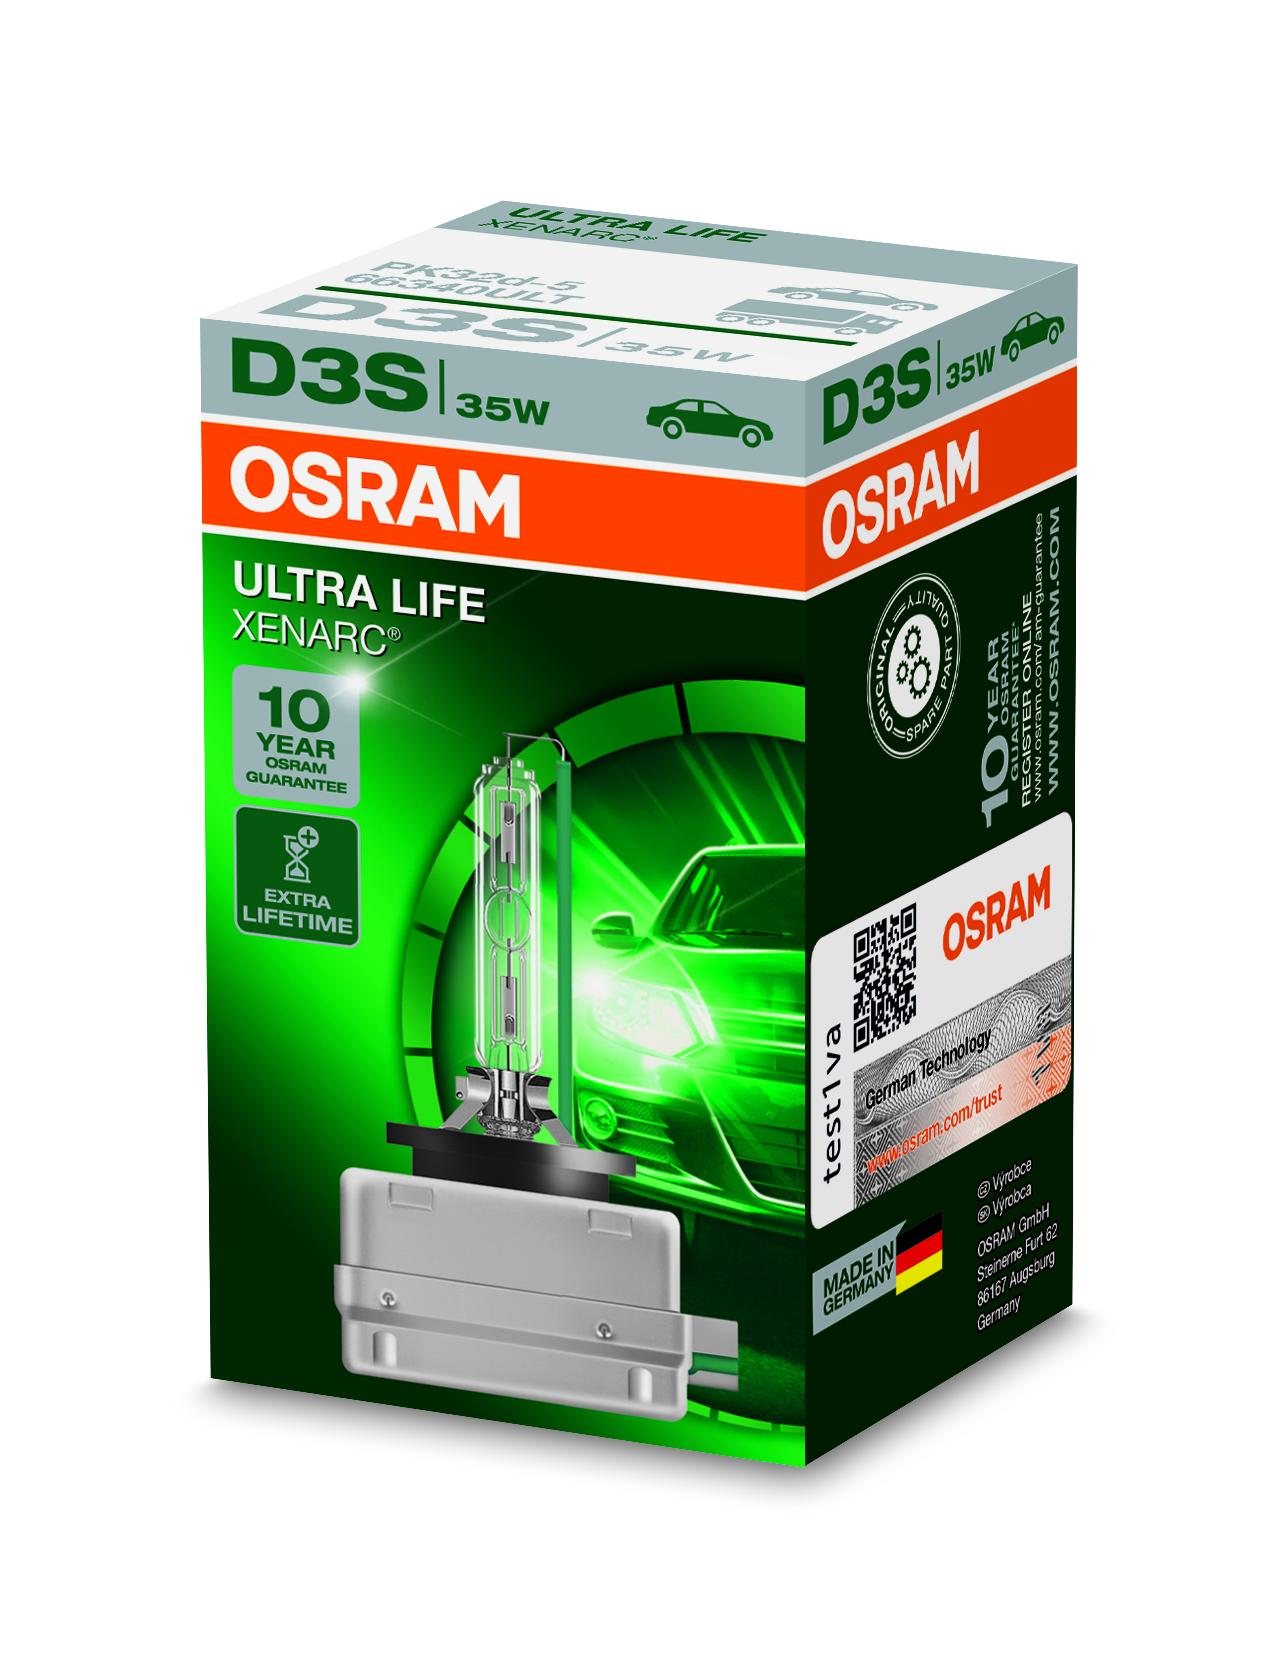 Osram Xenonová výbojka, XENARC ULTRALIFE, D3S, PK32d-5, 12/24V, 35W, 66240ULT